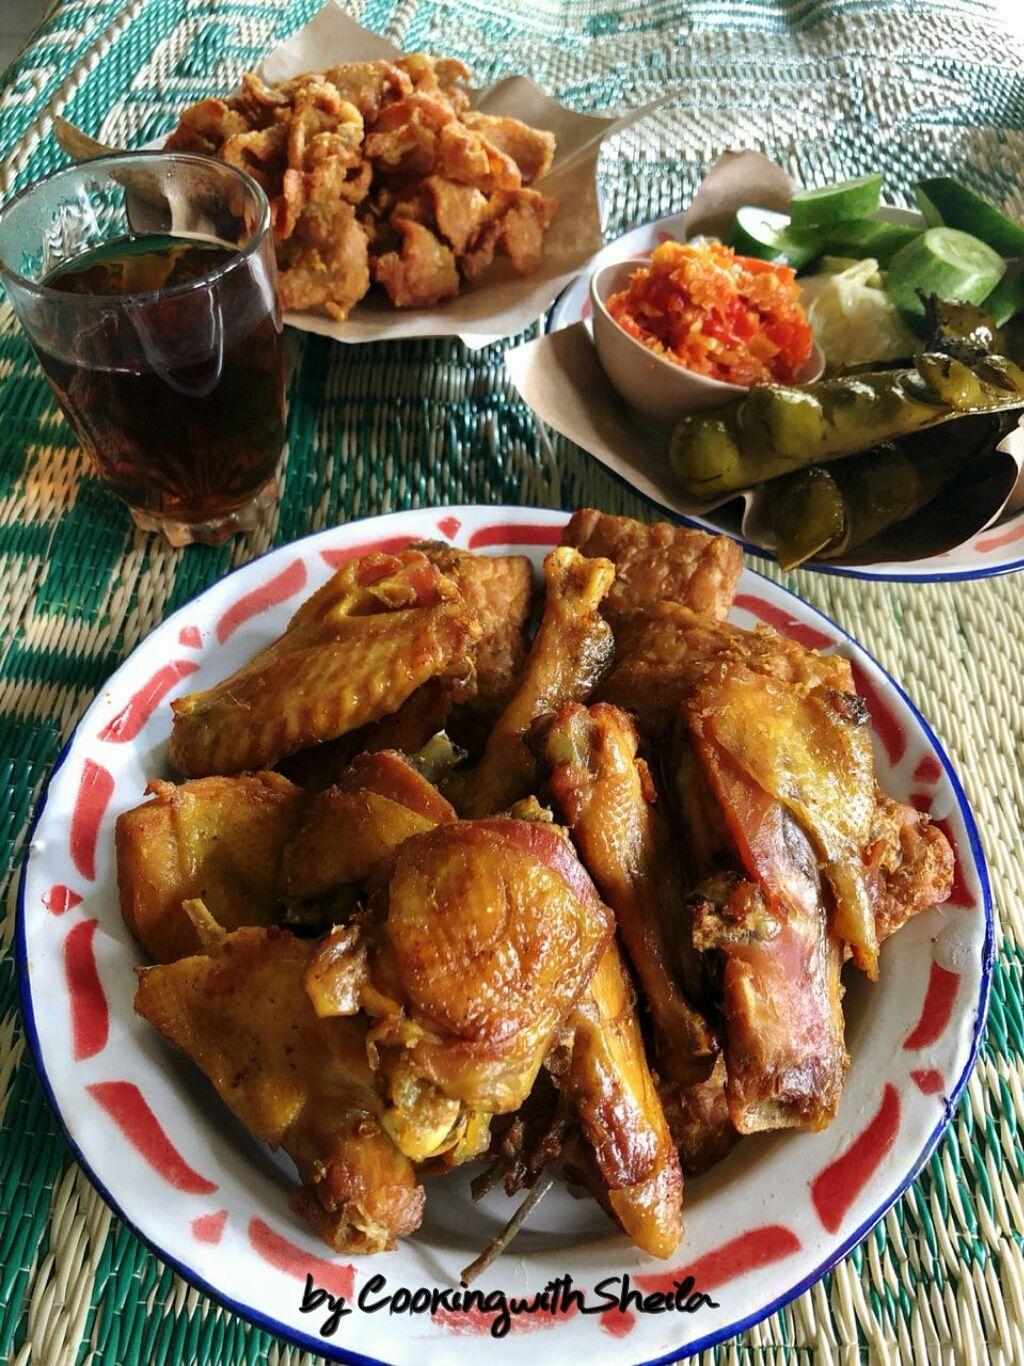 Resep Berikut Ini Resep Ayam Goreng Kuning Ya Pernah Saya Share Sebelumnya Tetapi Resep Kali Ini Saya Dapat Dari Mbak Mei Seka Resep Ayam Ayam Goreng Masakan